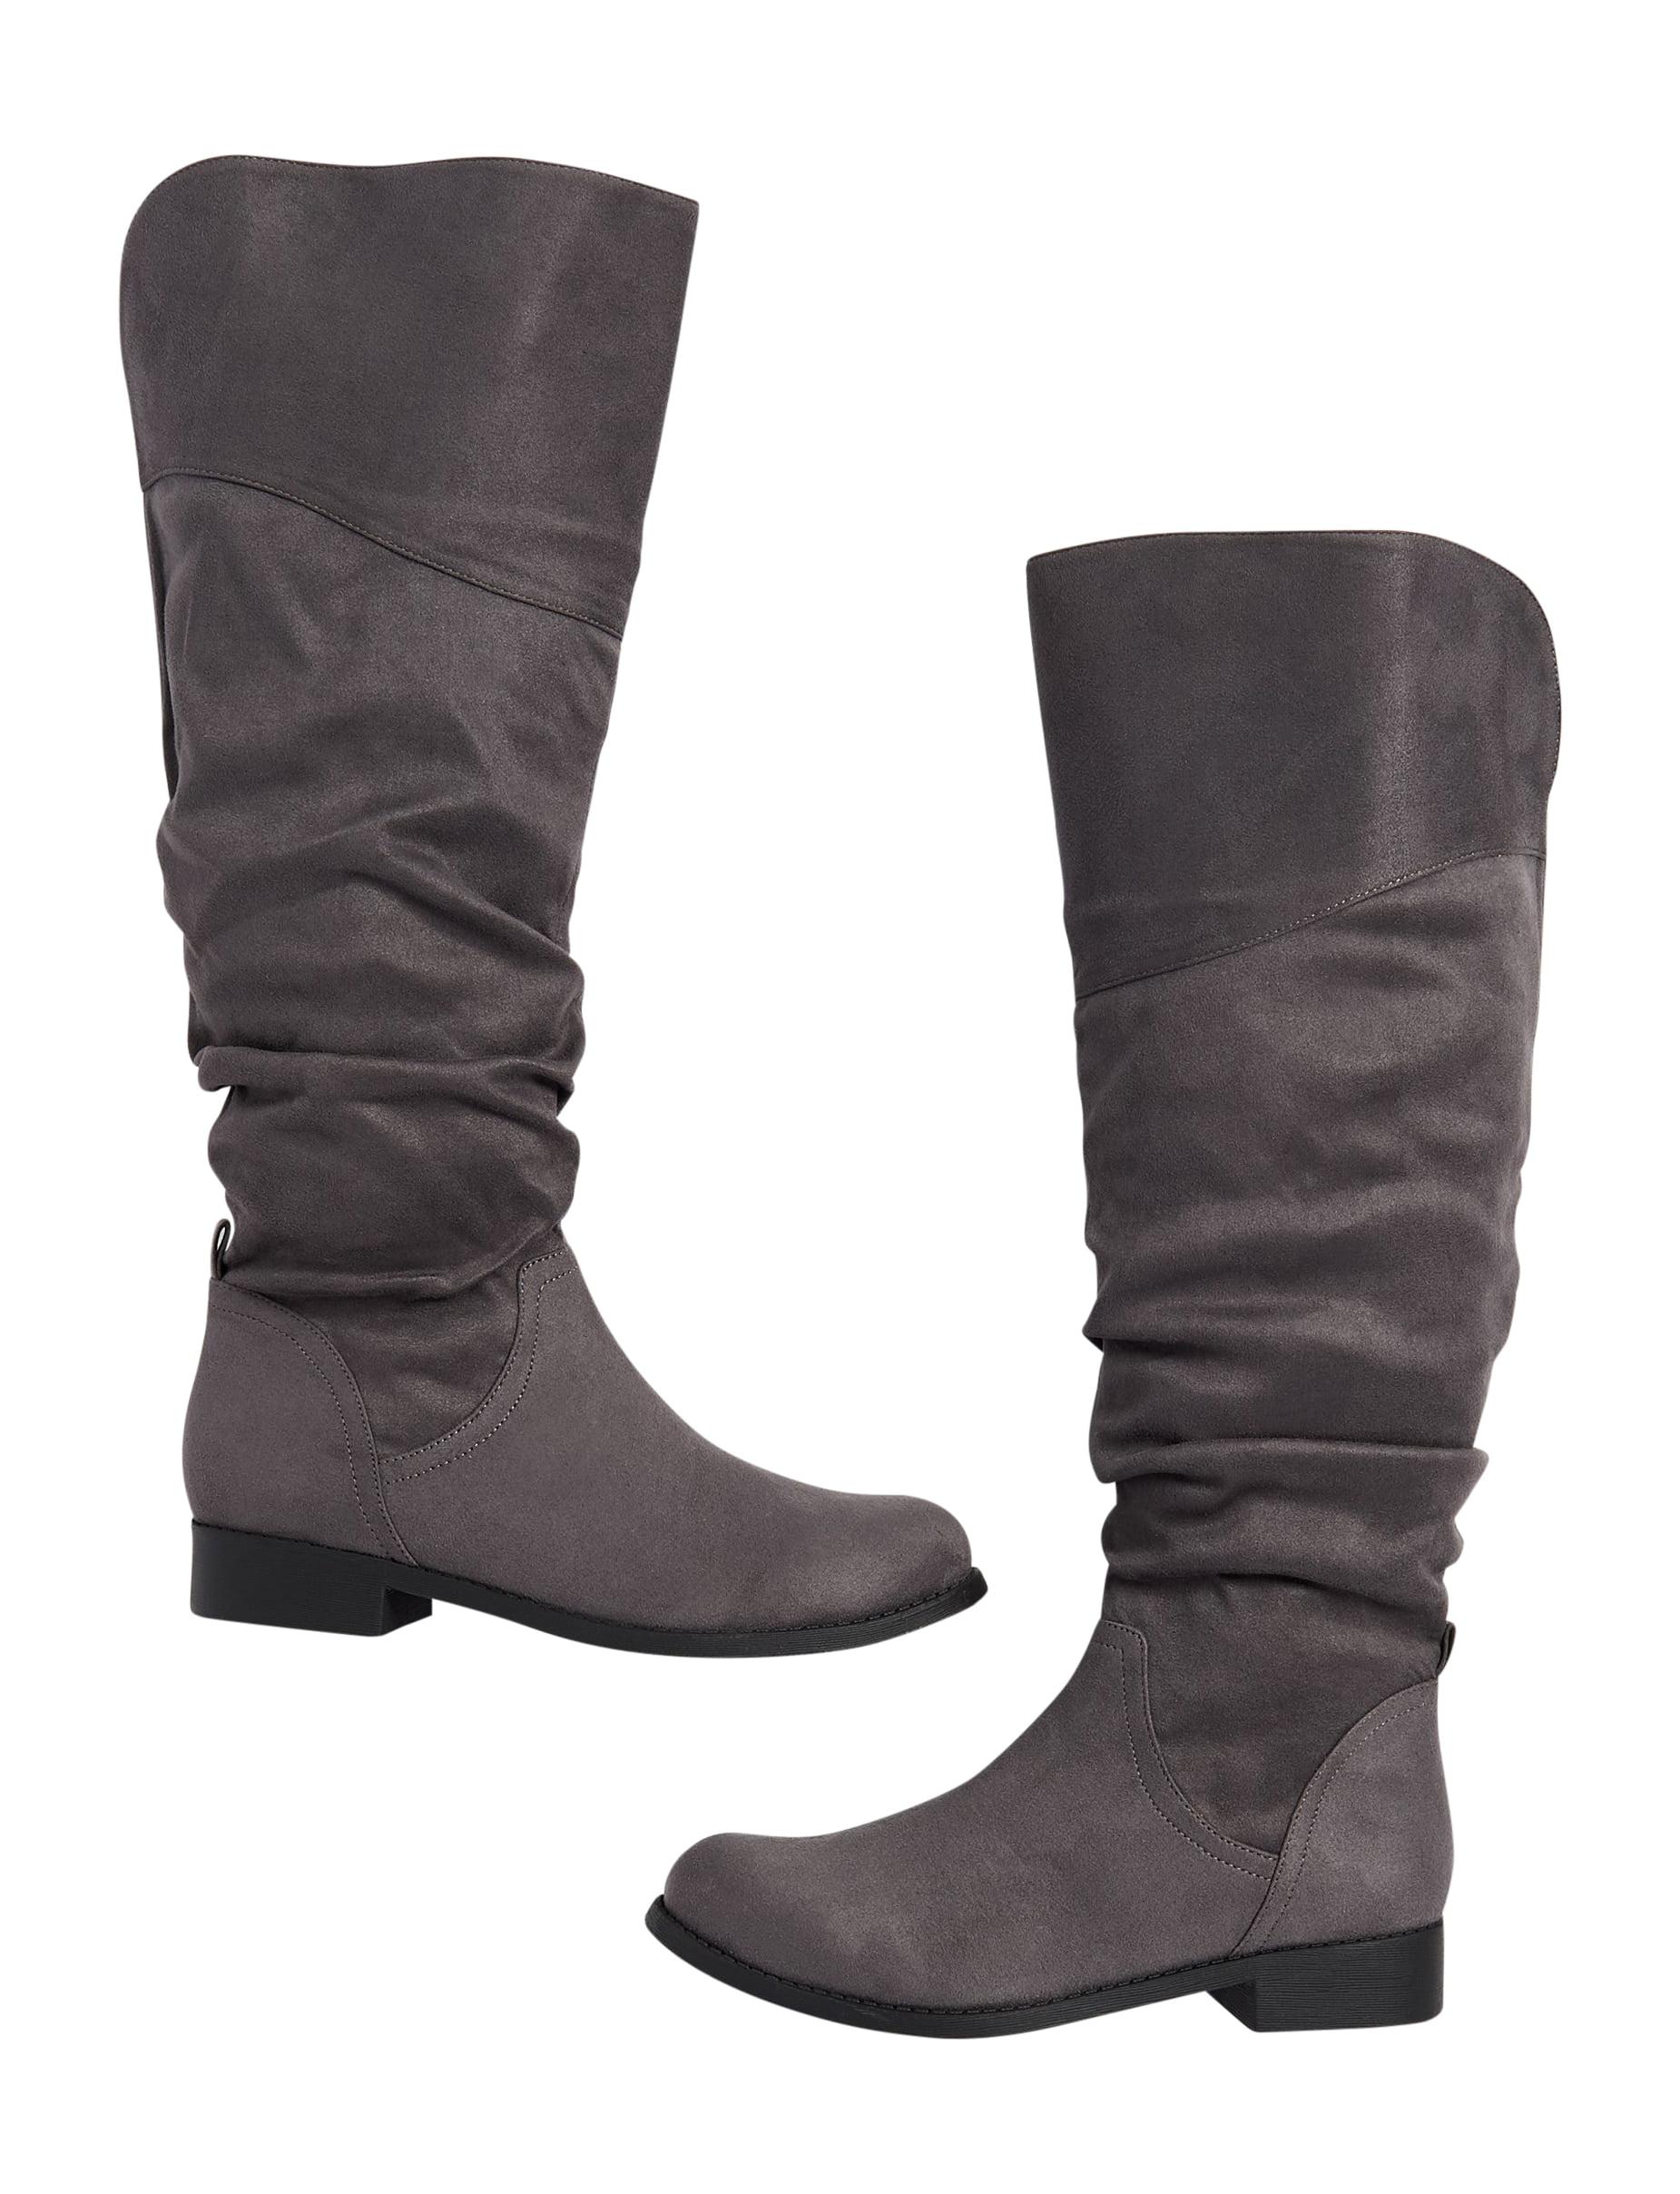 610ba8f0f6c Maurices - Greta Scrunch Tall Boot - Walmart.com